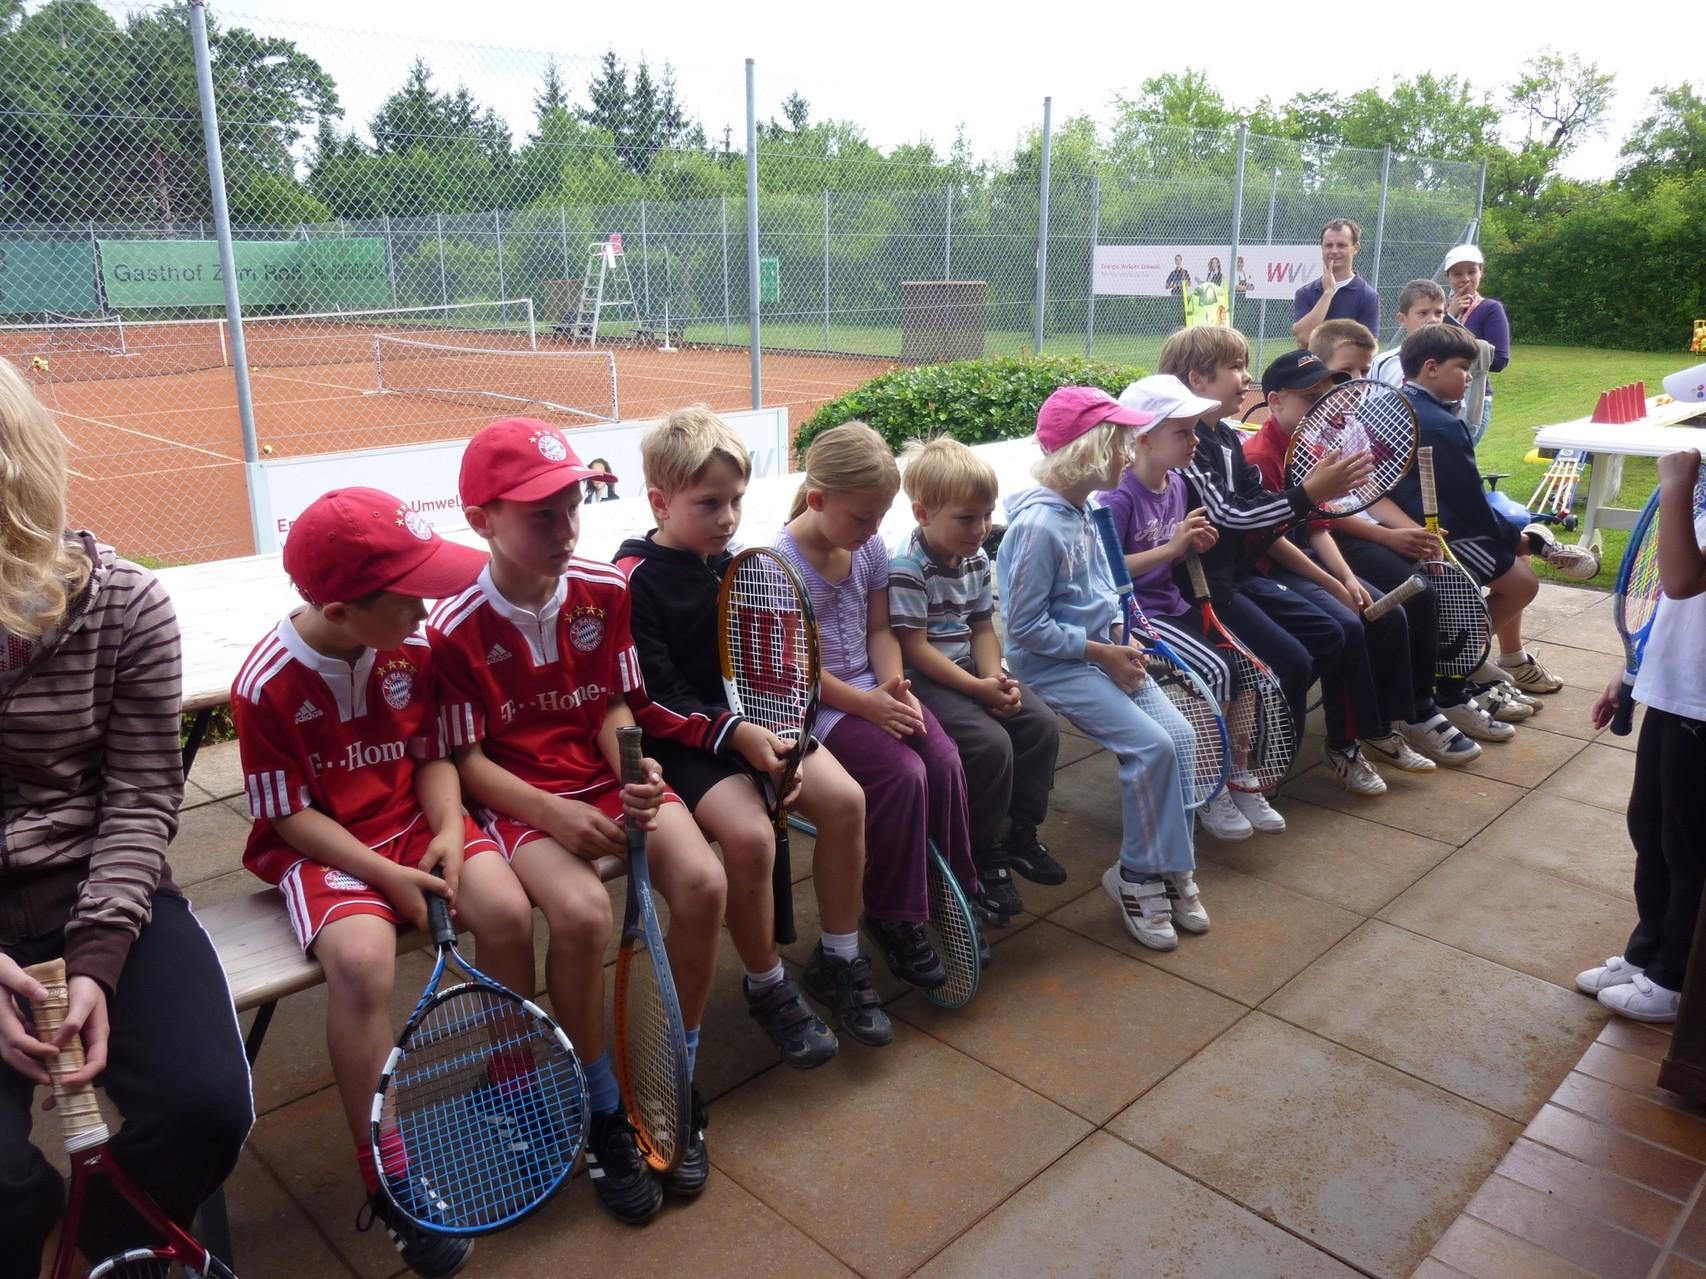 Tennis-Jugendcamp 2012